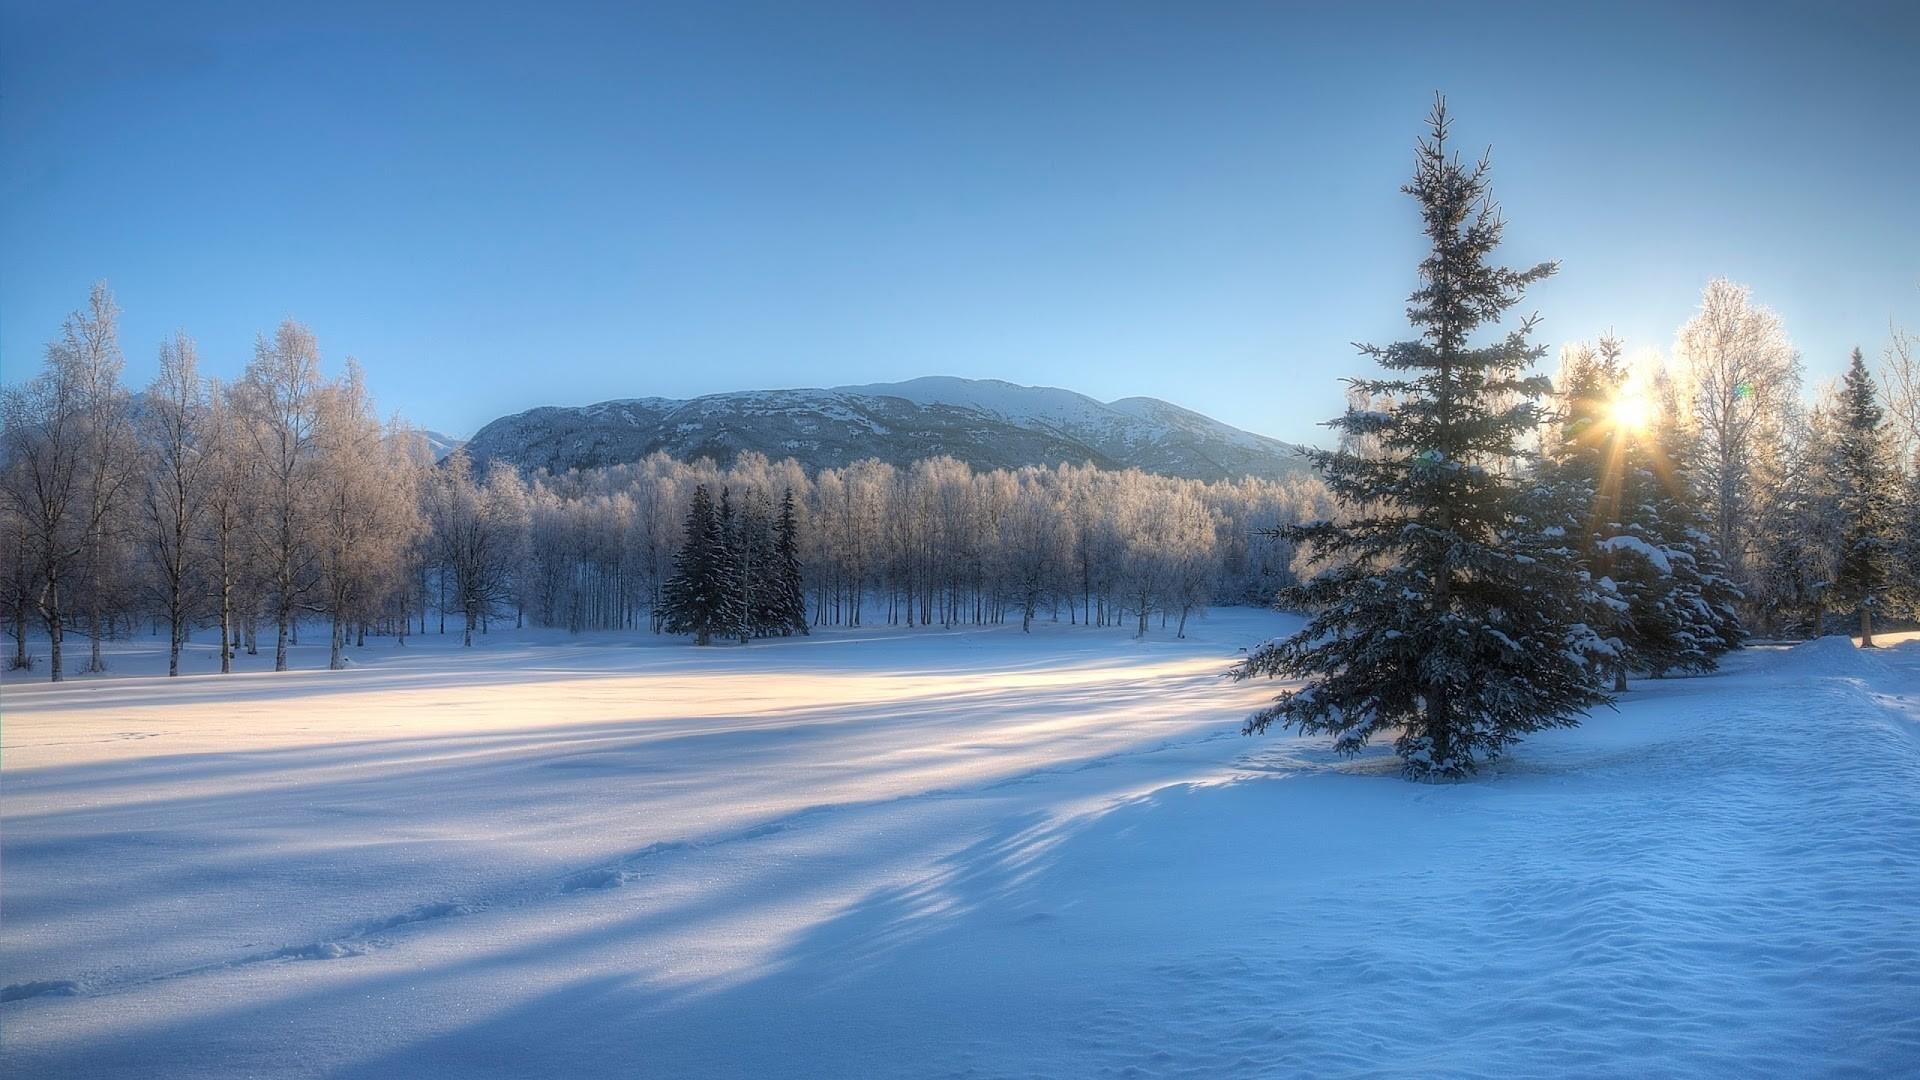 Winter Wonderland Wallpaper and Background